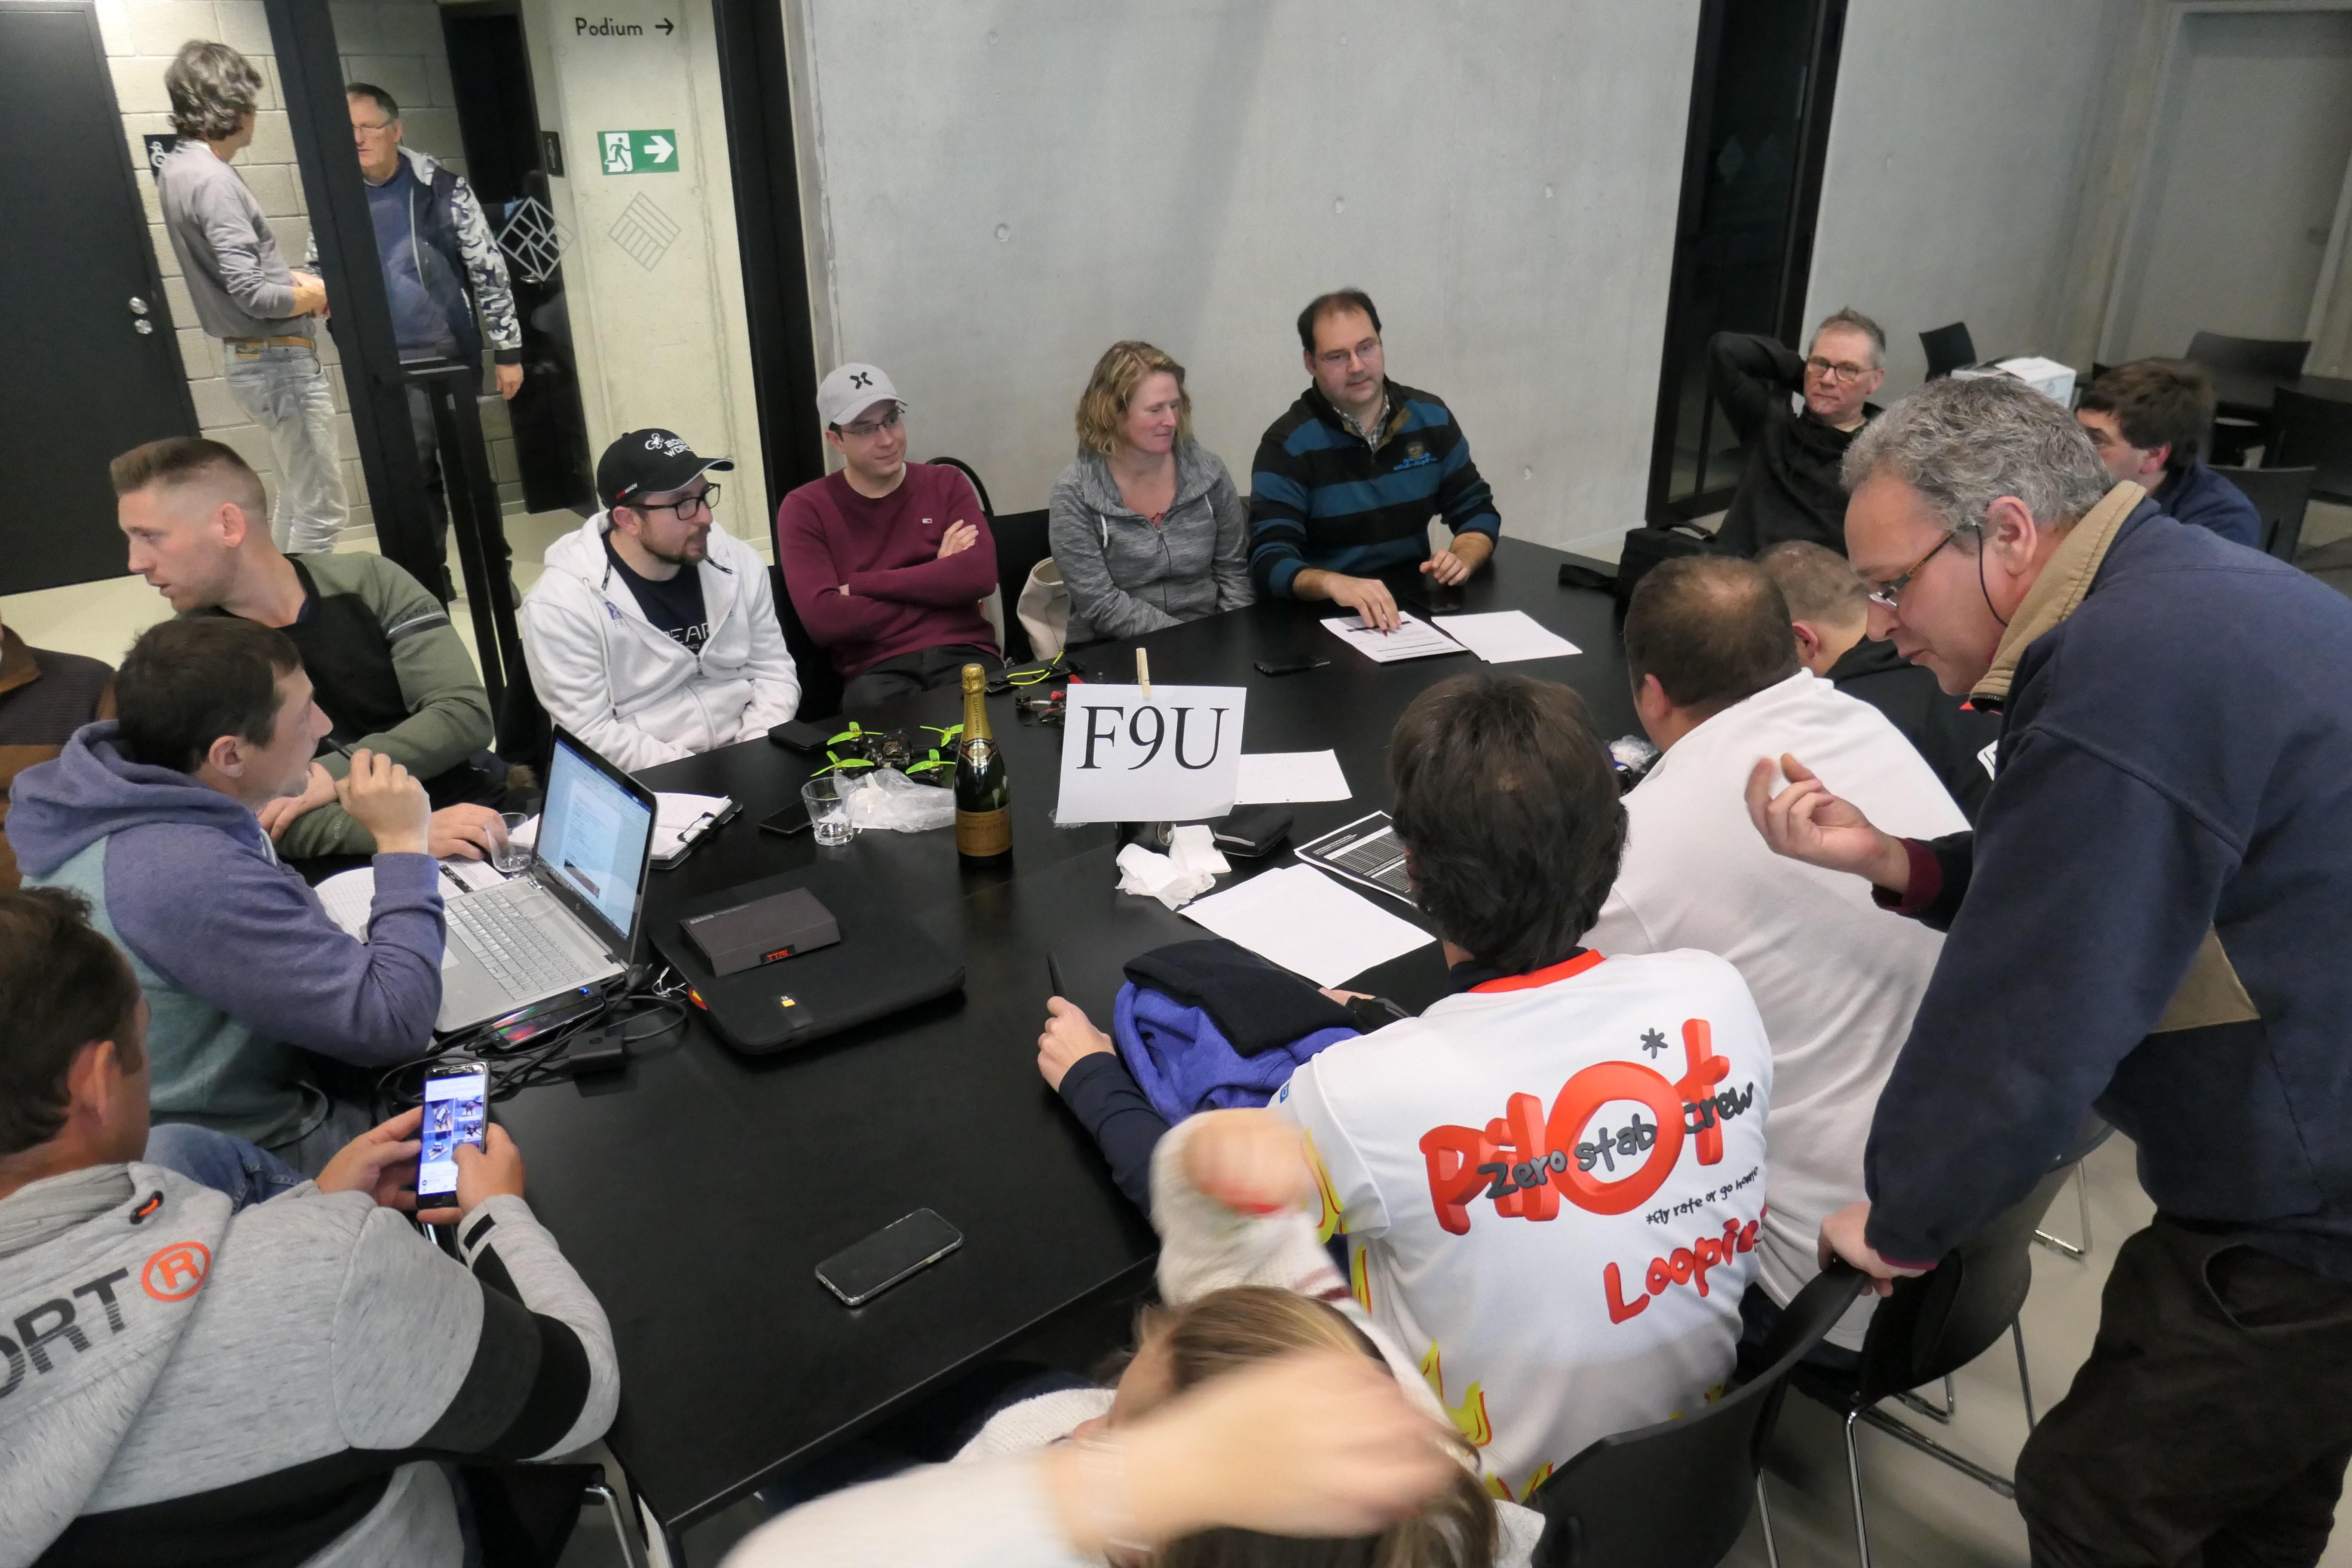 The F9U FPV Racing table